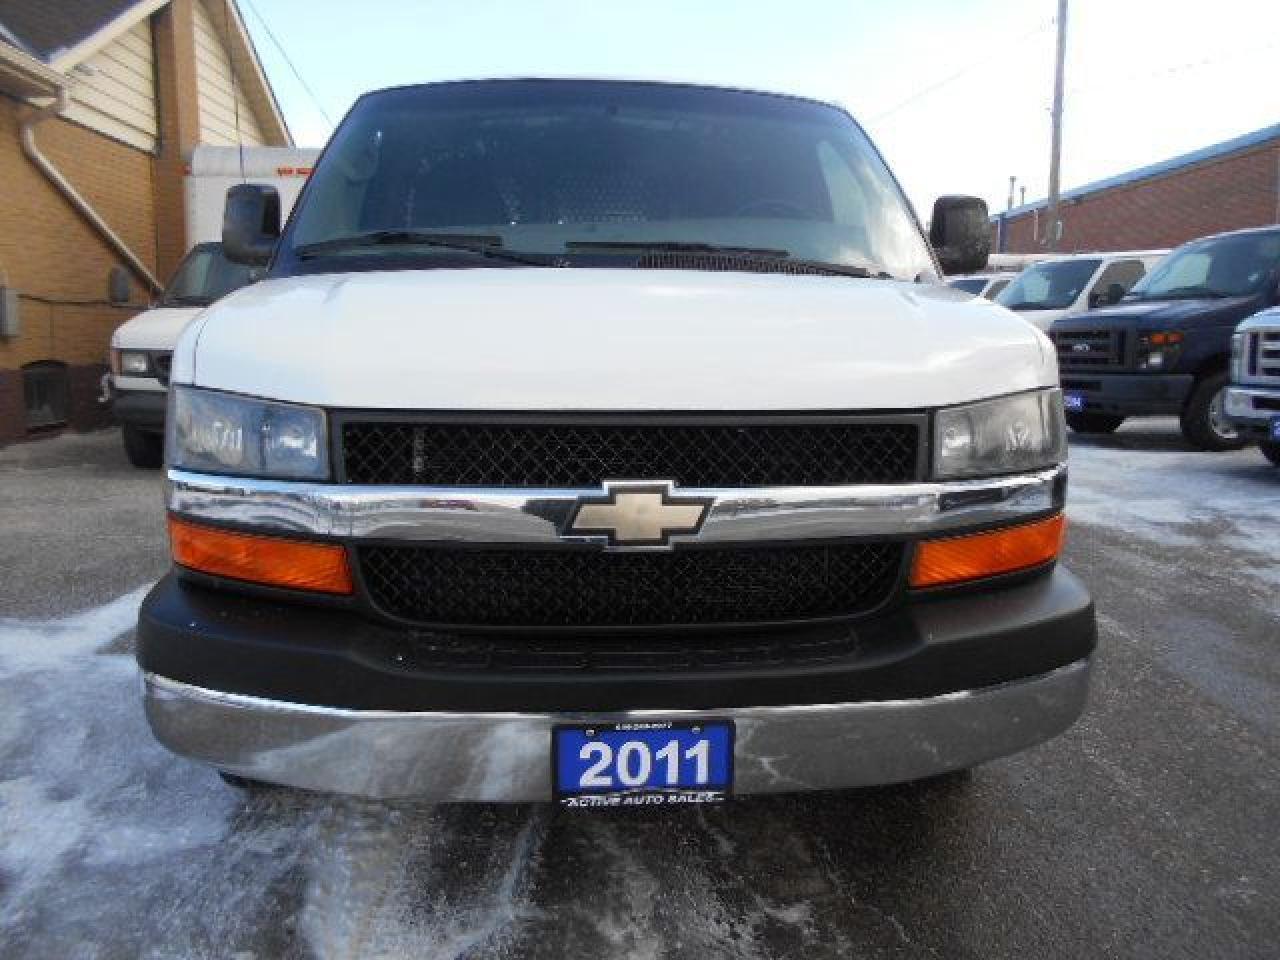 2011 Chevrolet Express 1500 CARGO 4.3L V6 Chrome Package Divider Certified